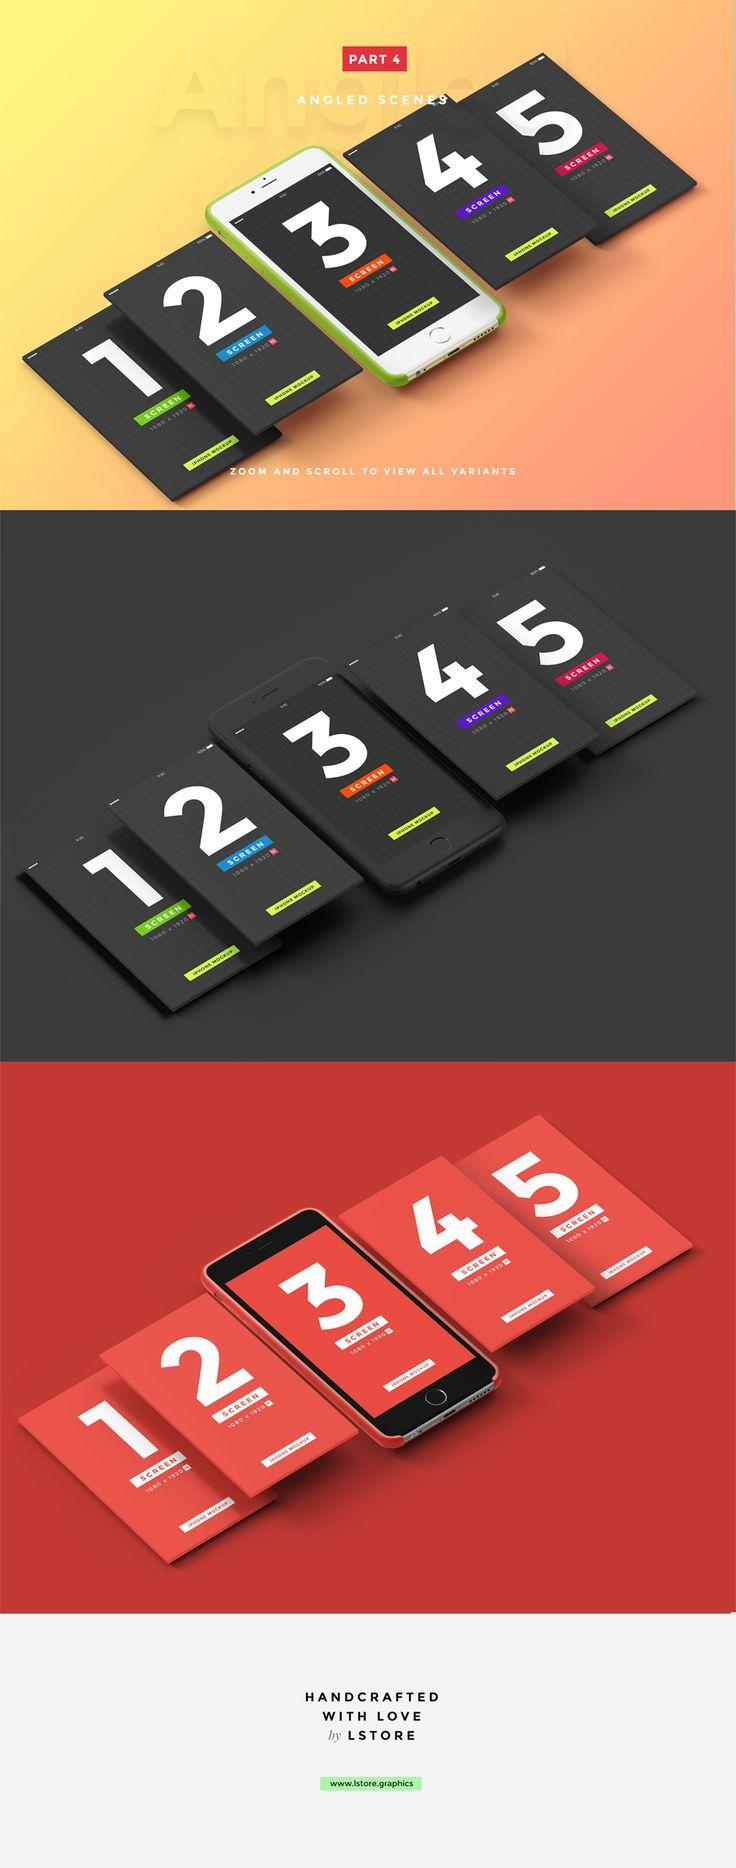 UI Presentation Kit, Device Mockups by LStore on @creativemarket